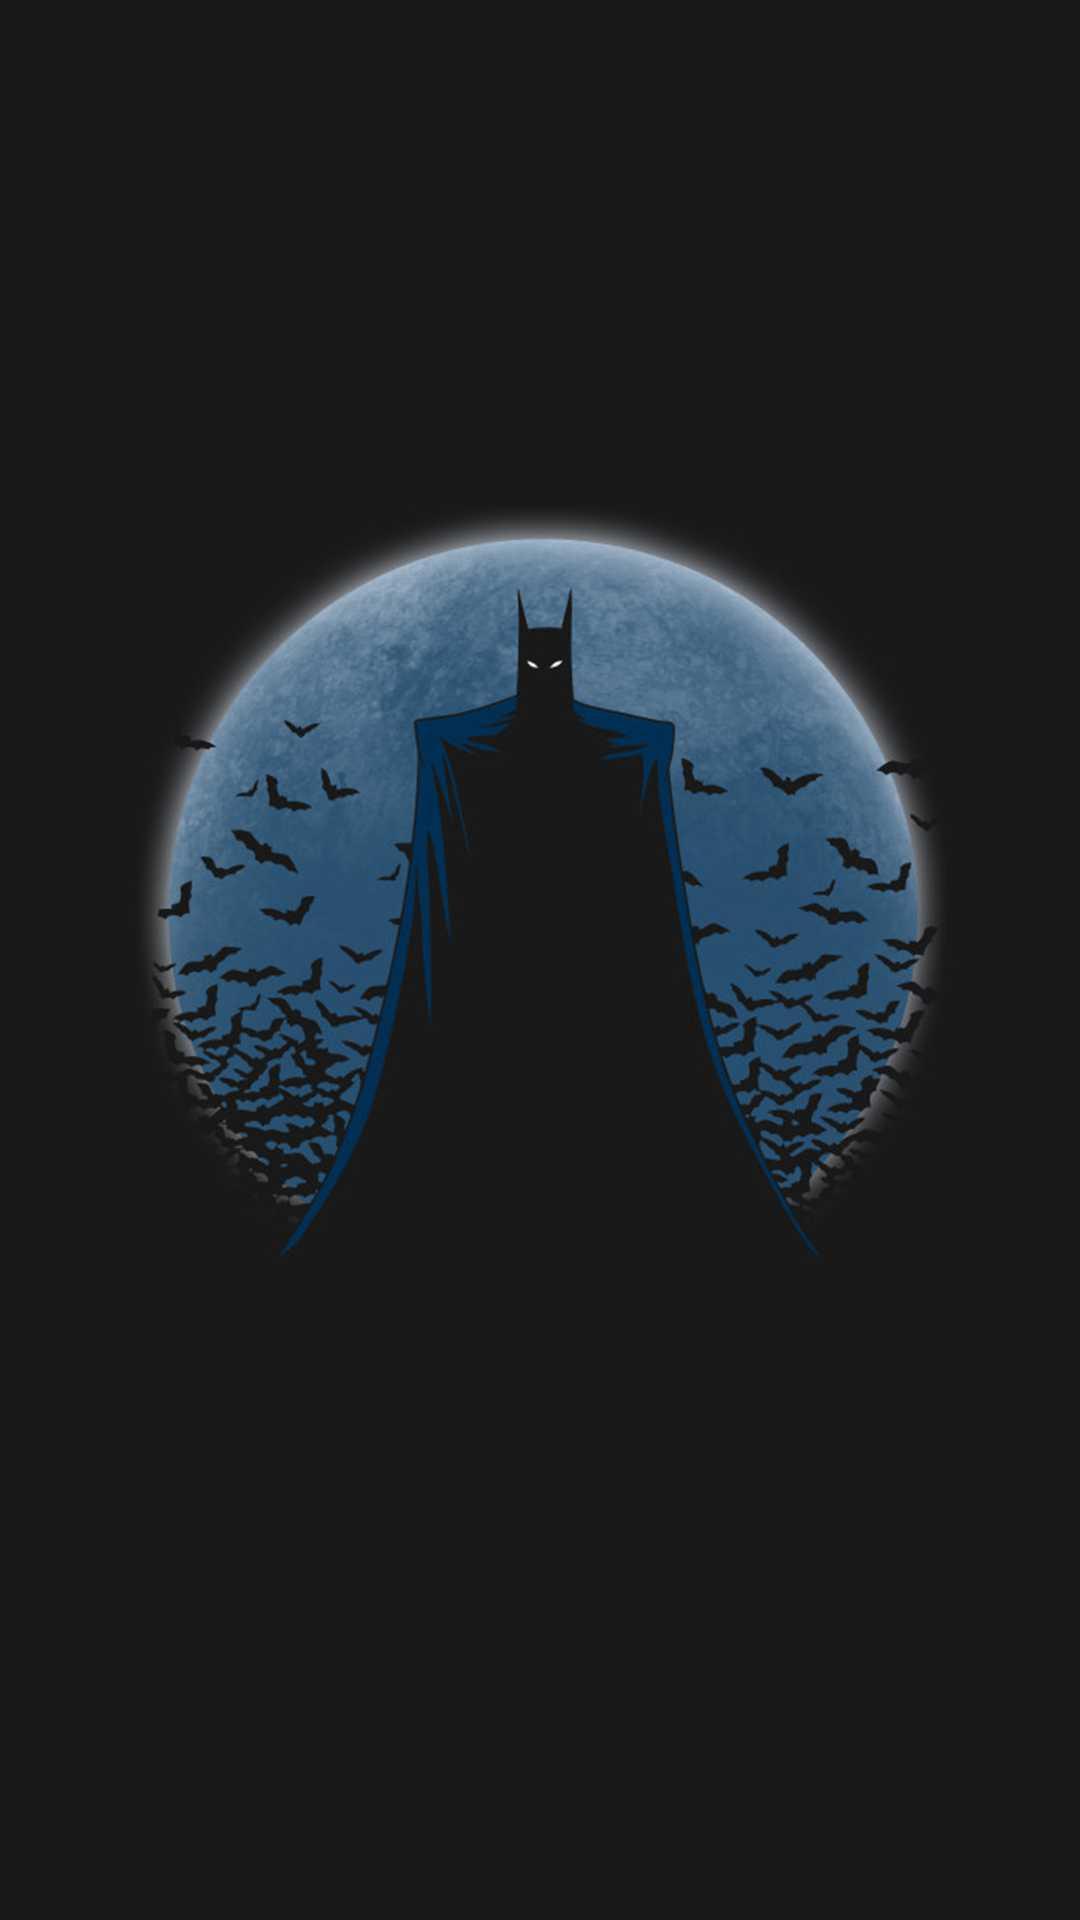 Dark Quotes Wallpaper The Batman Minimal Dark Iphone Wallpaper Iphone Wallpapers